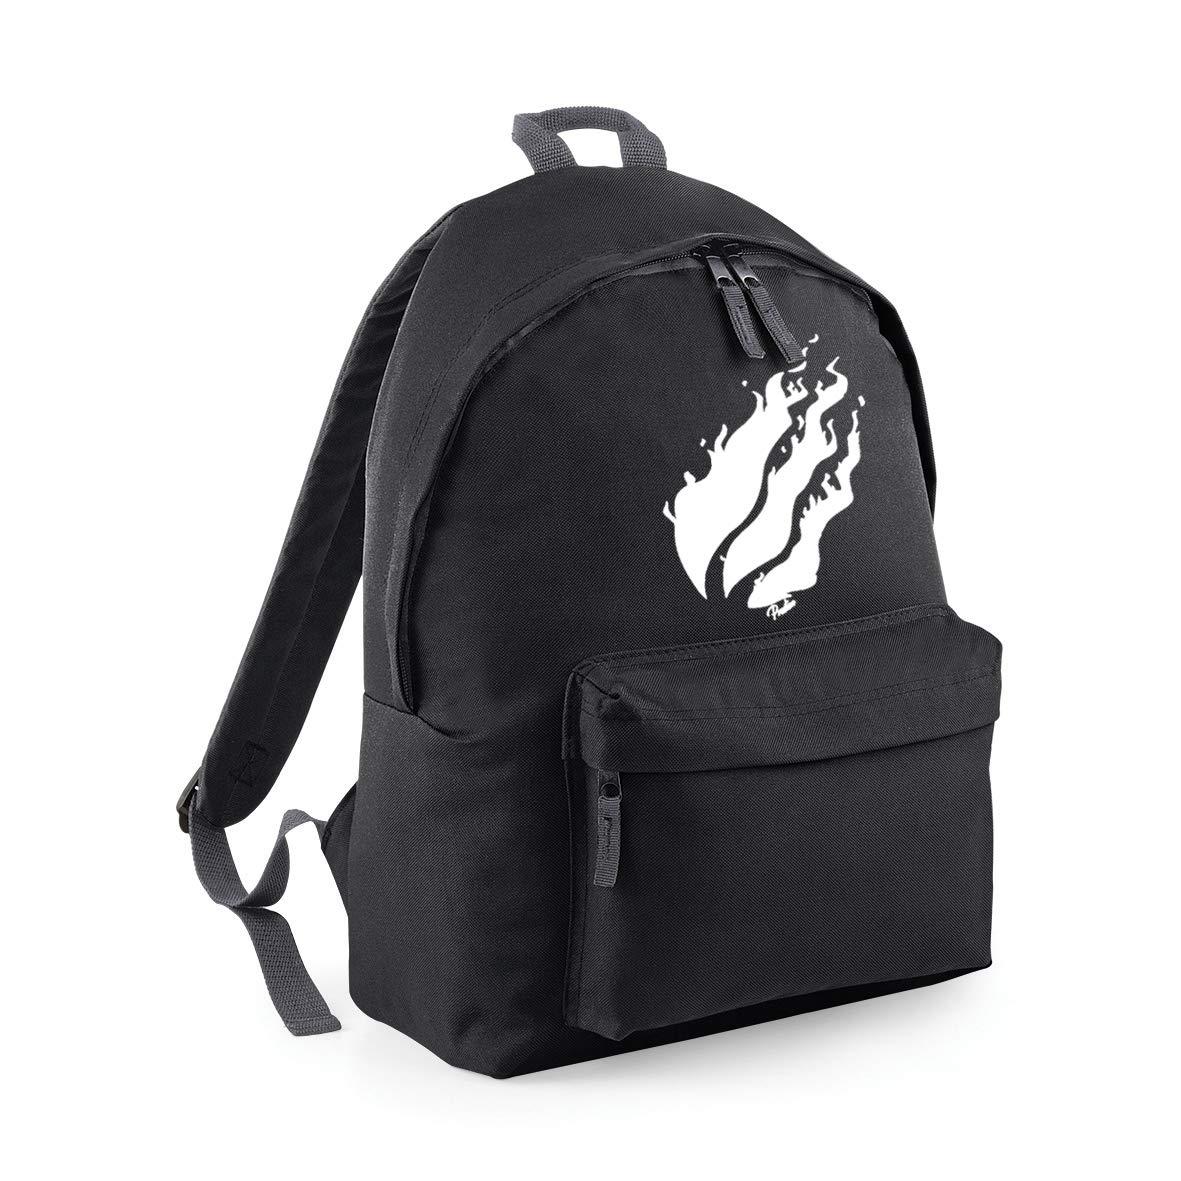 Pumukli Prestonplayz White Flame Bagbase Fashion Backpack School Bag 42 x 32 x 21 cm